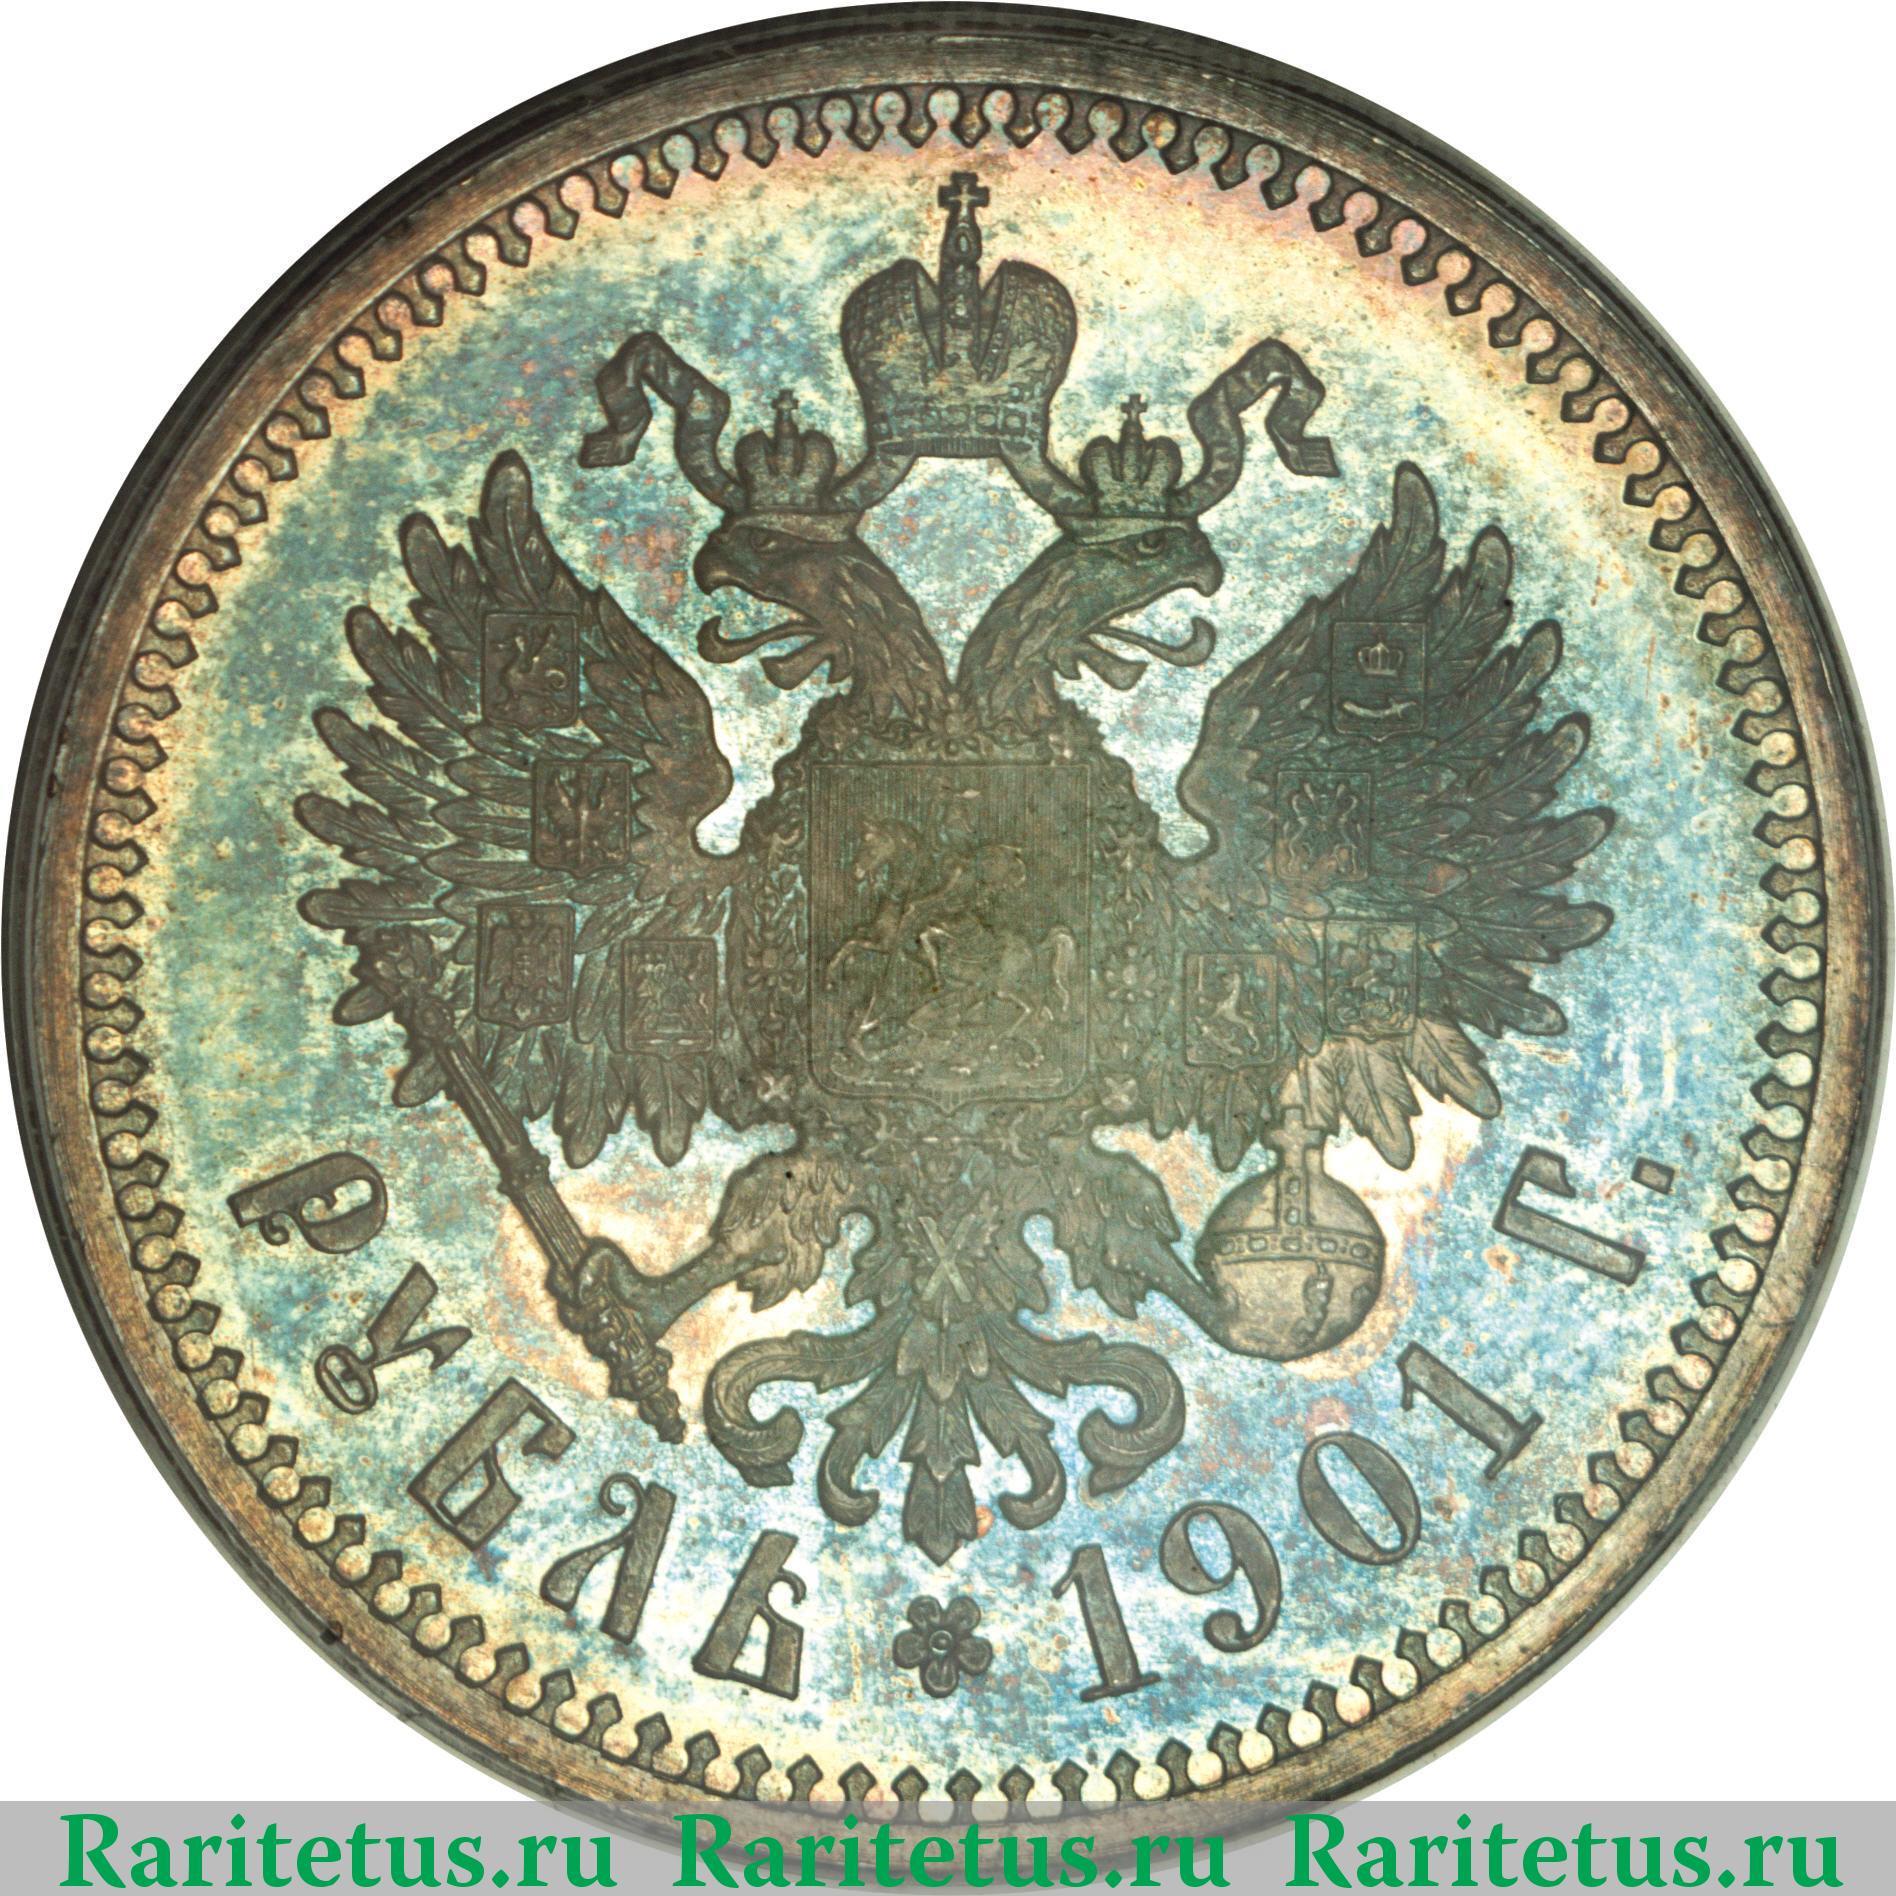 Монета 1 рубль 1901 года цена 5 менге 1977 цена